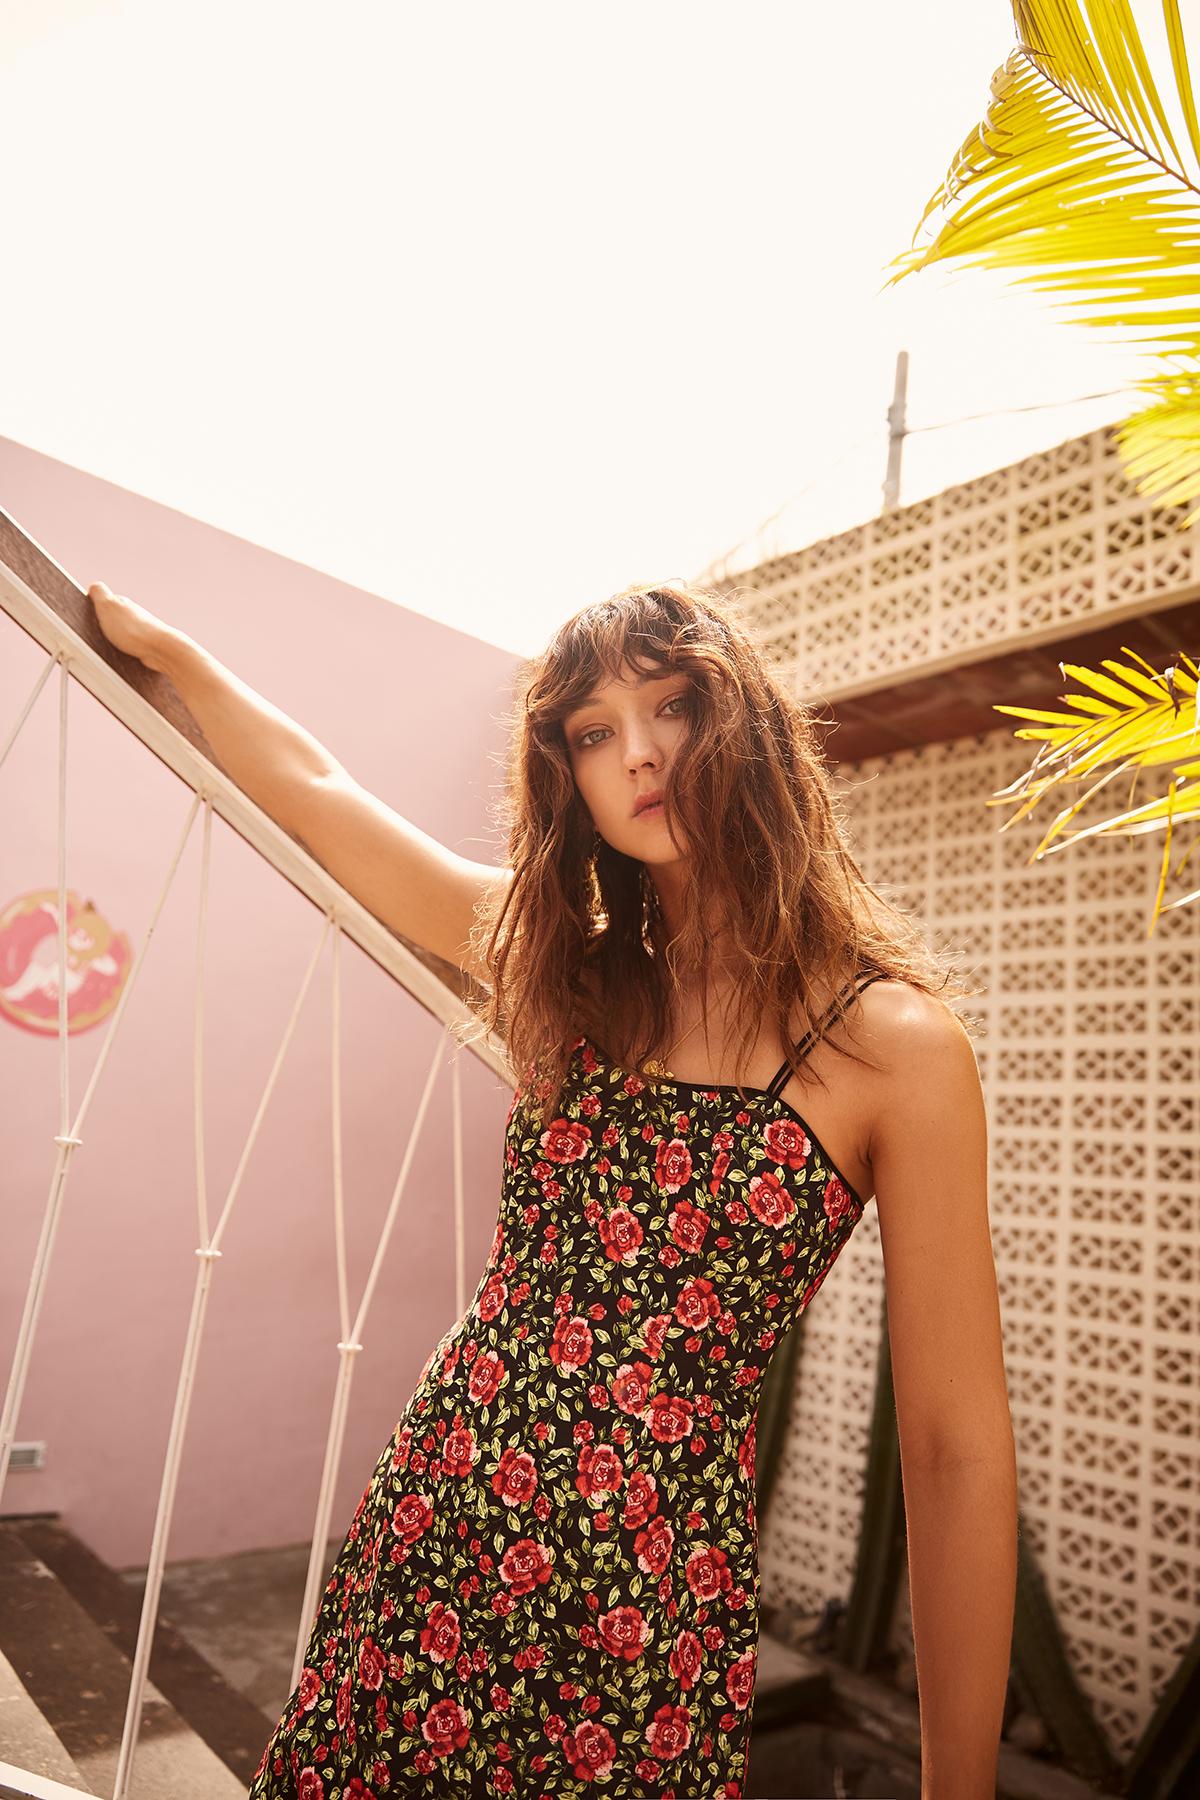 Shop C/MEO Outline Mini Dress.